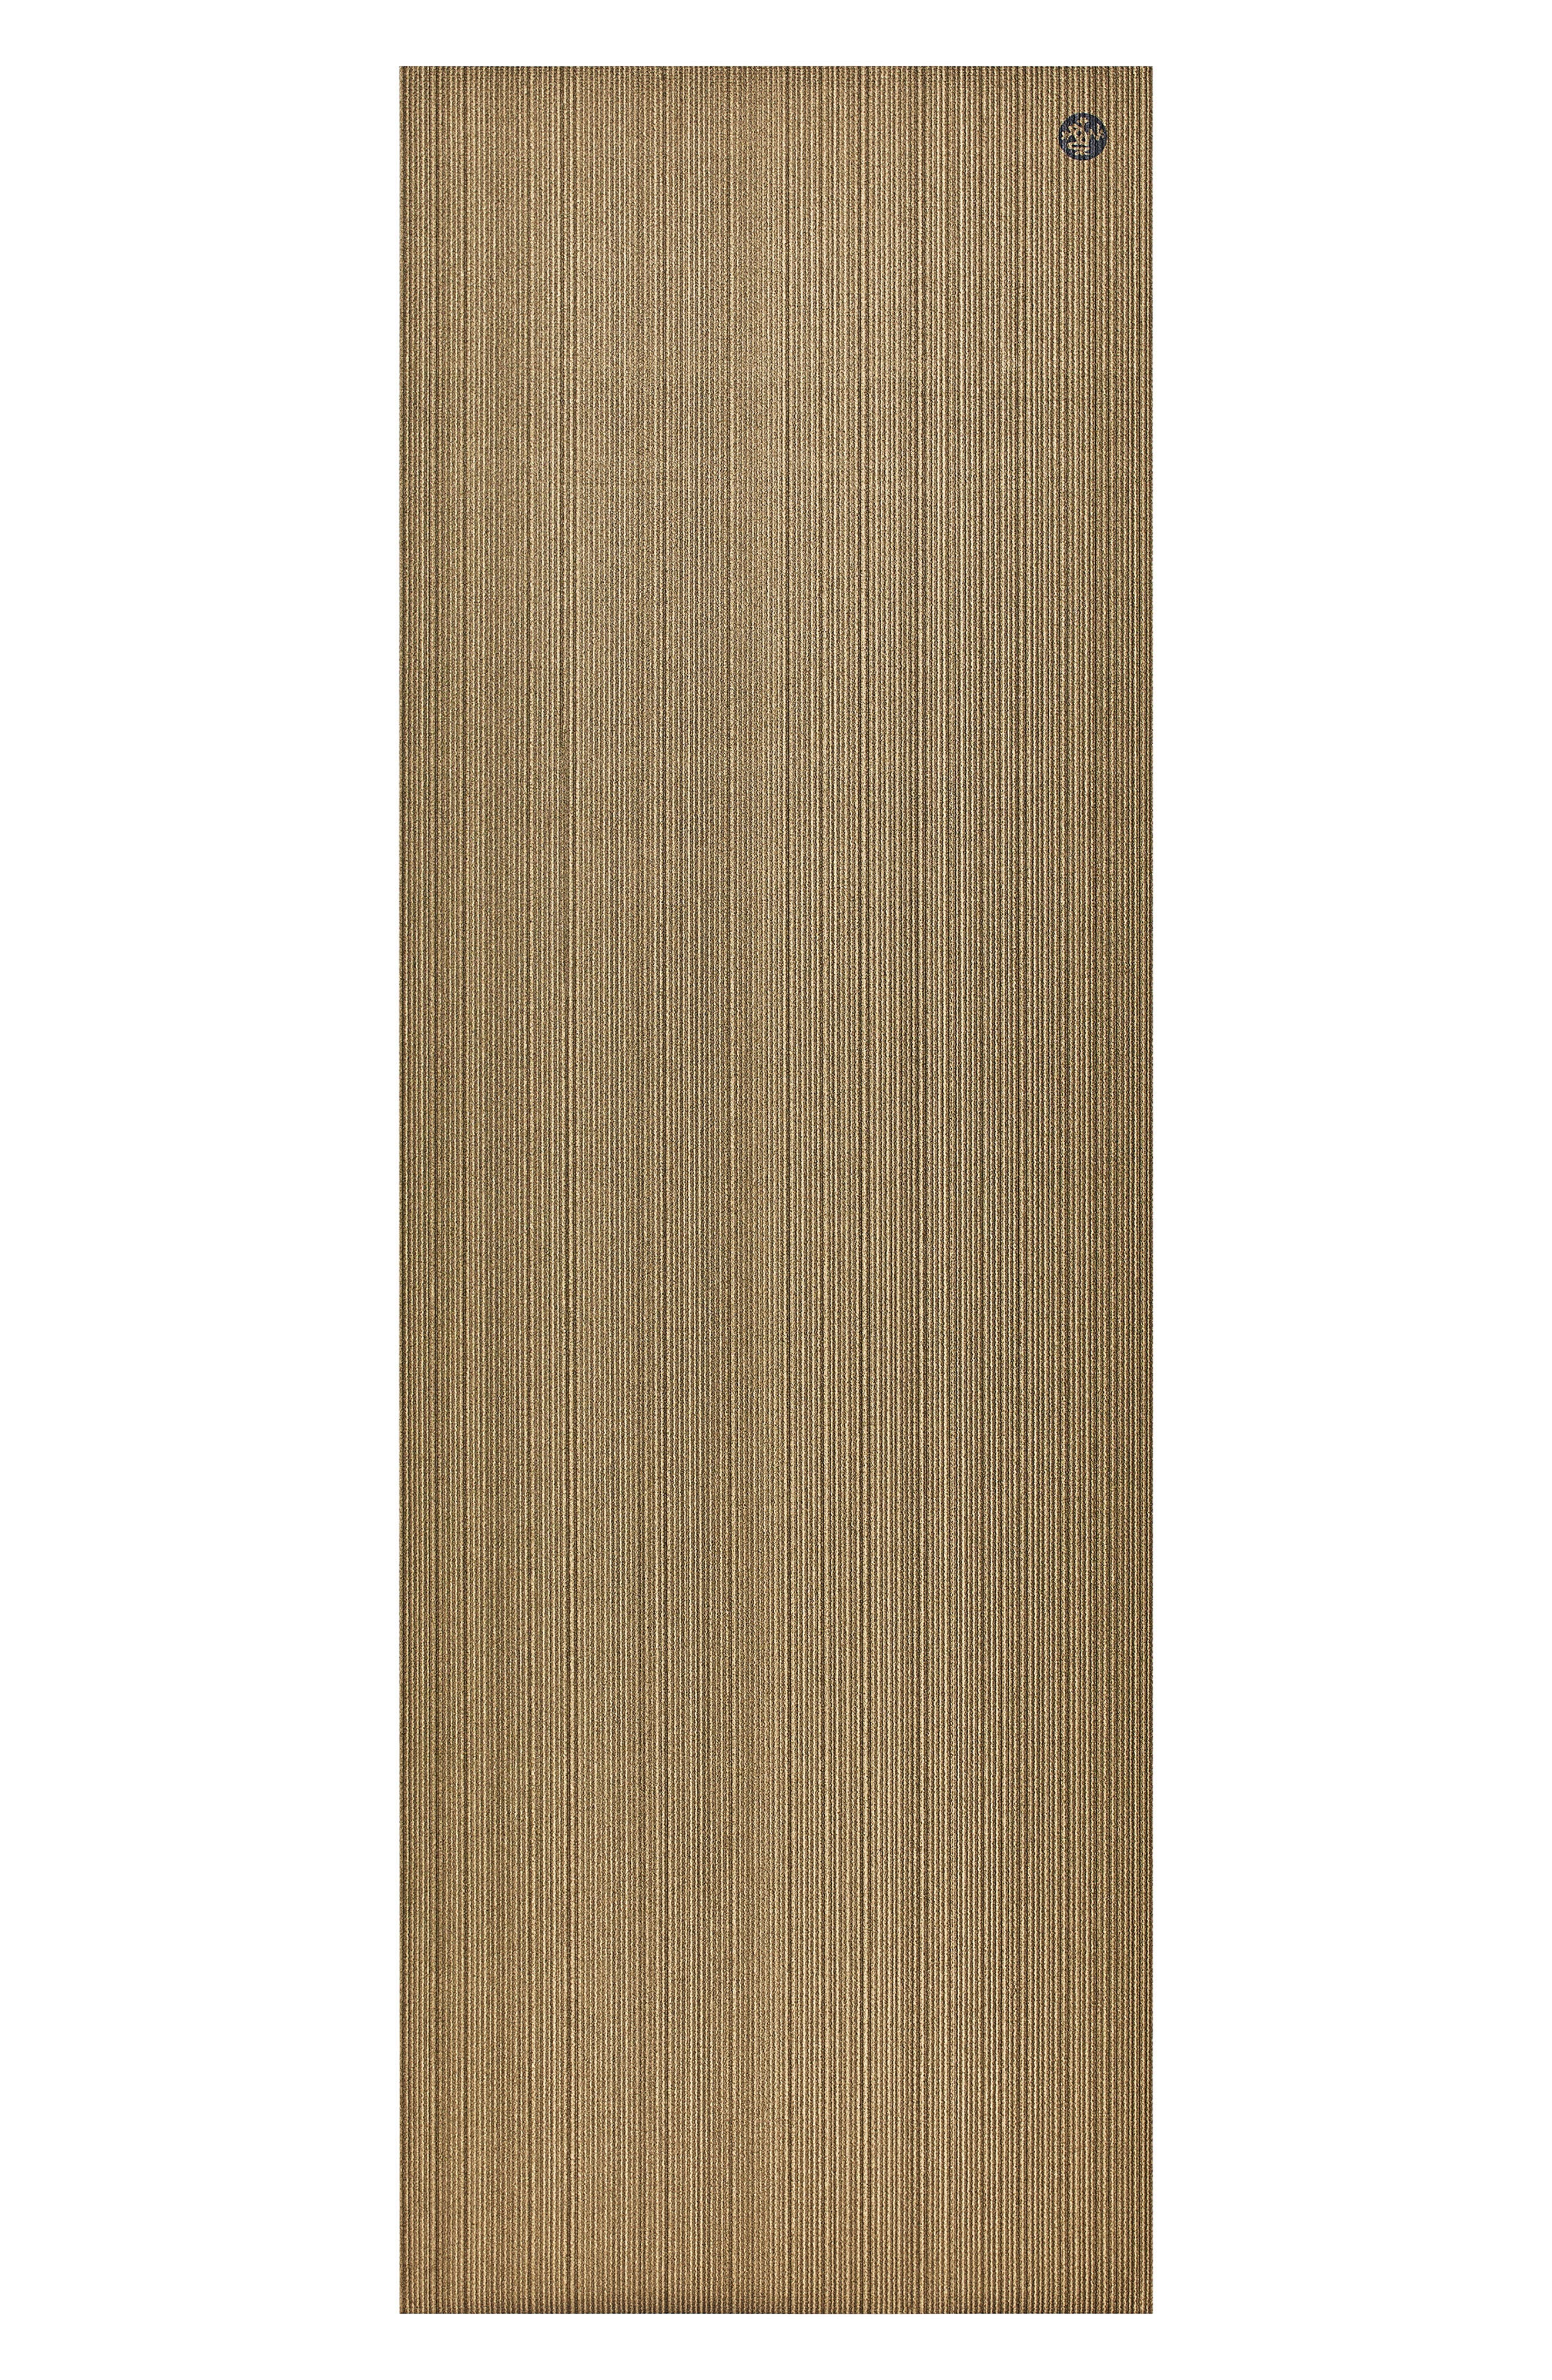 Pr Olite® Yoga Mat by Manduka